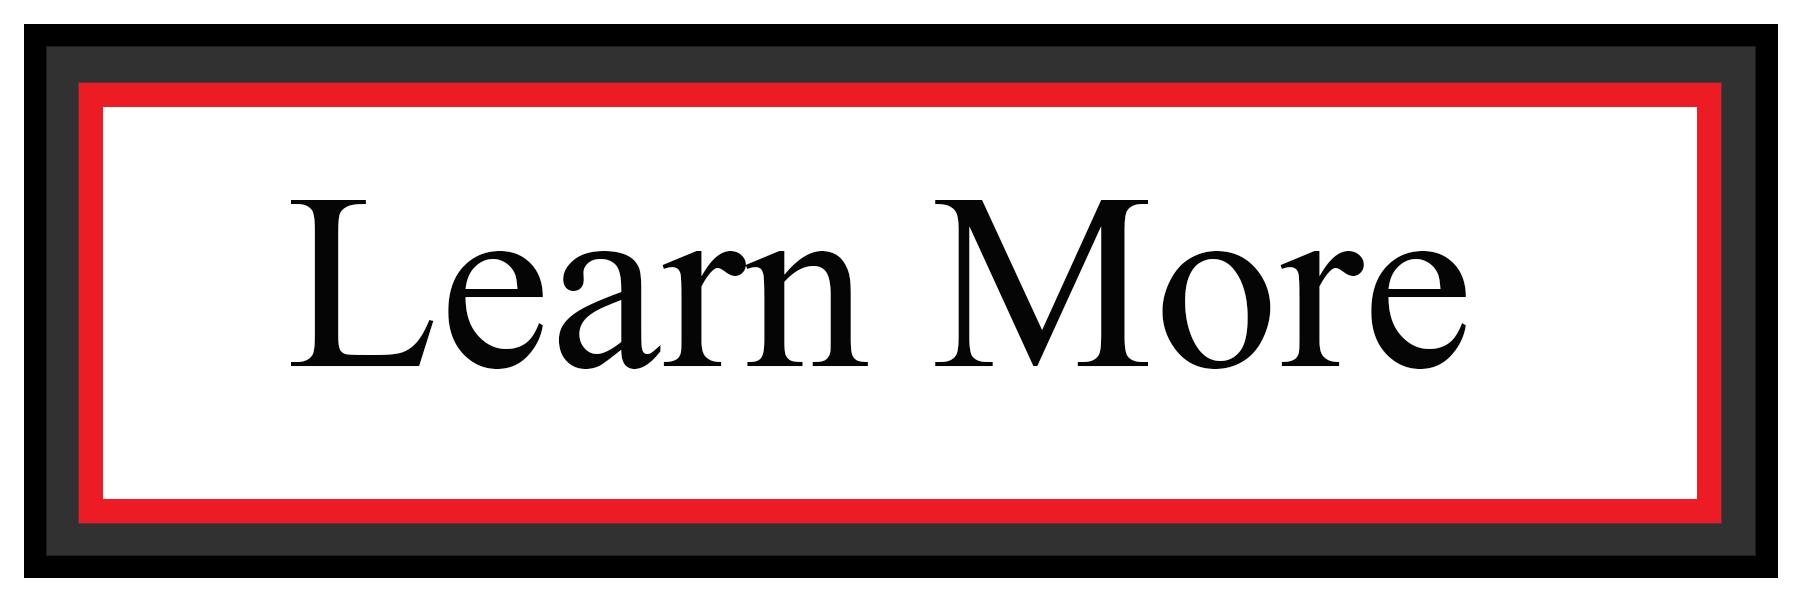 learn-more-1-.jpg